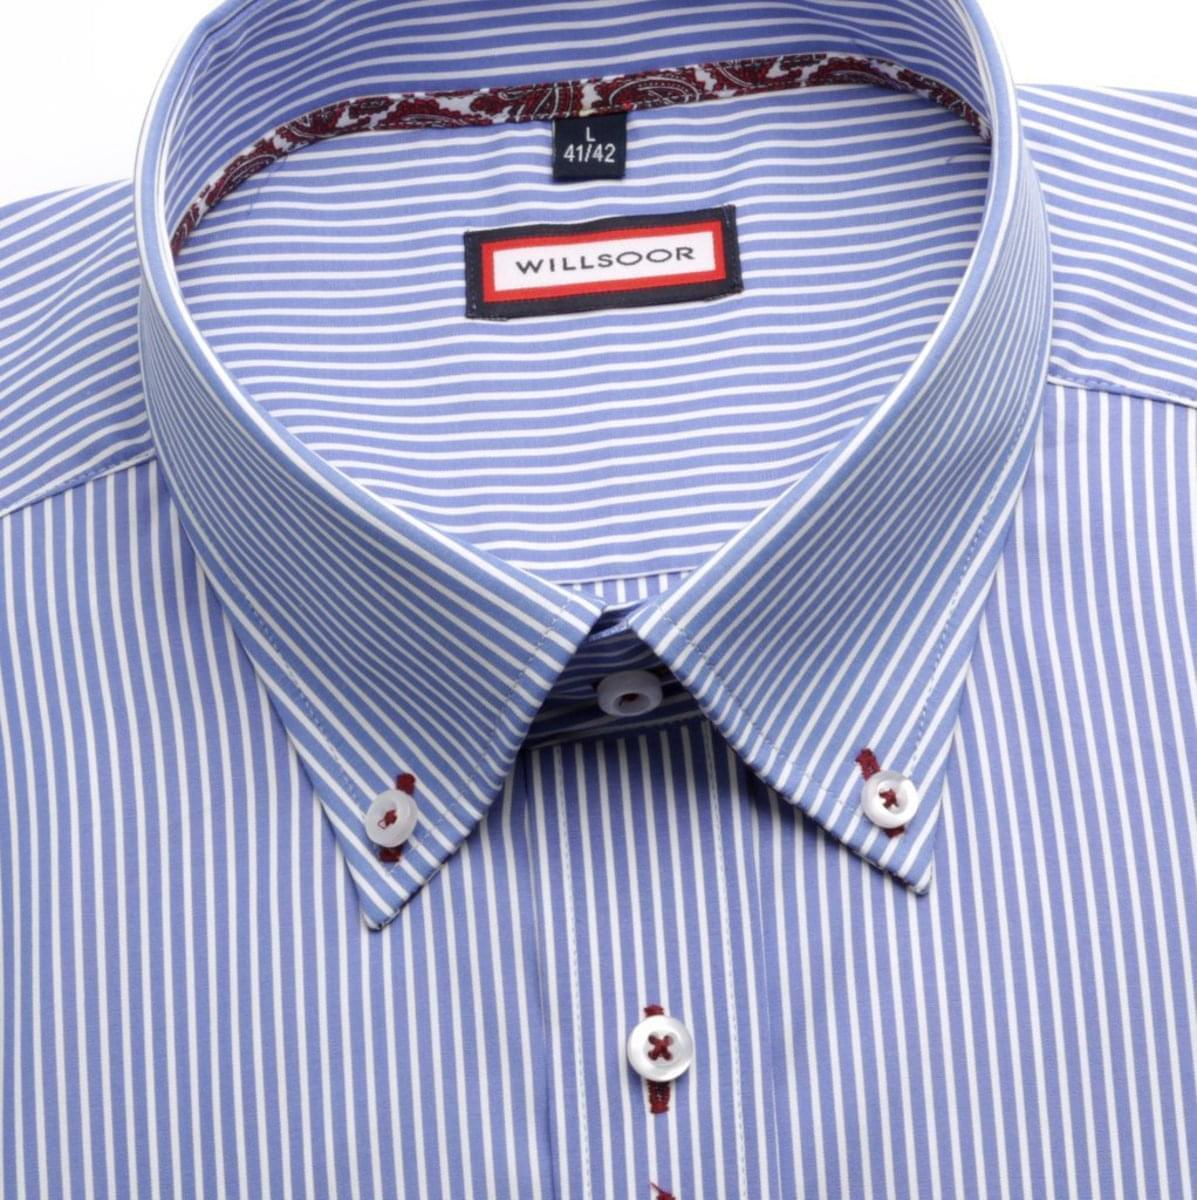 Košile WR Classic (výška 188-194)3934 188-194 / XL (43/44)